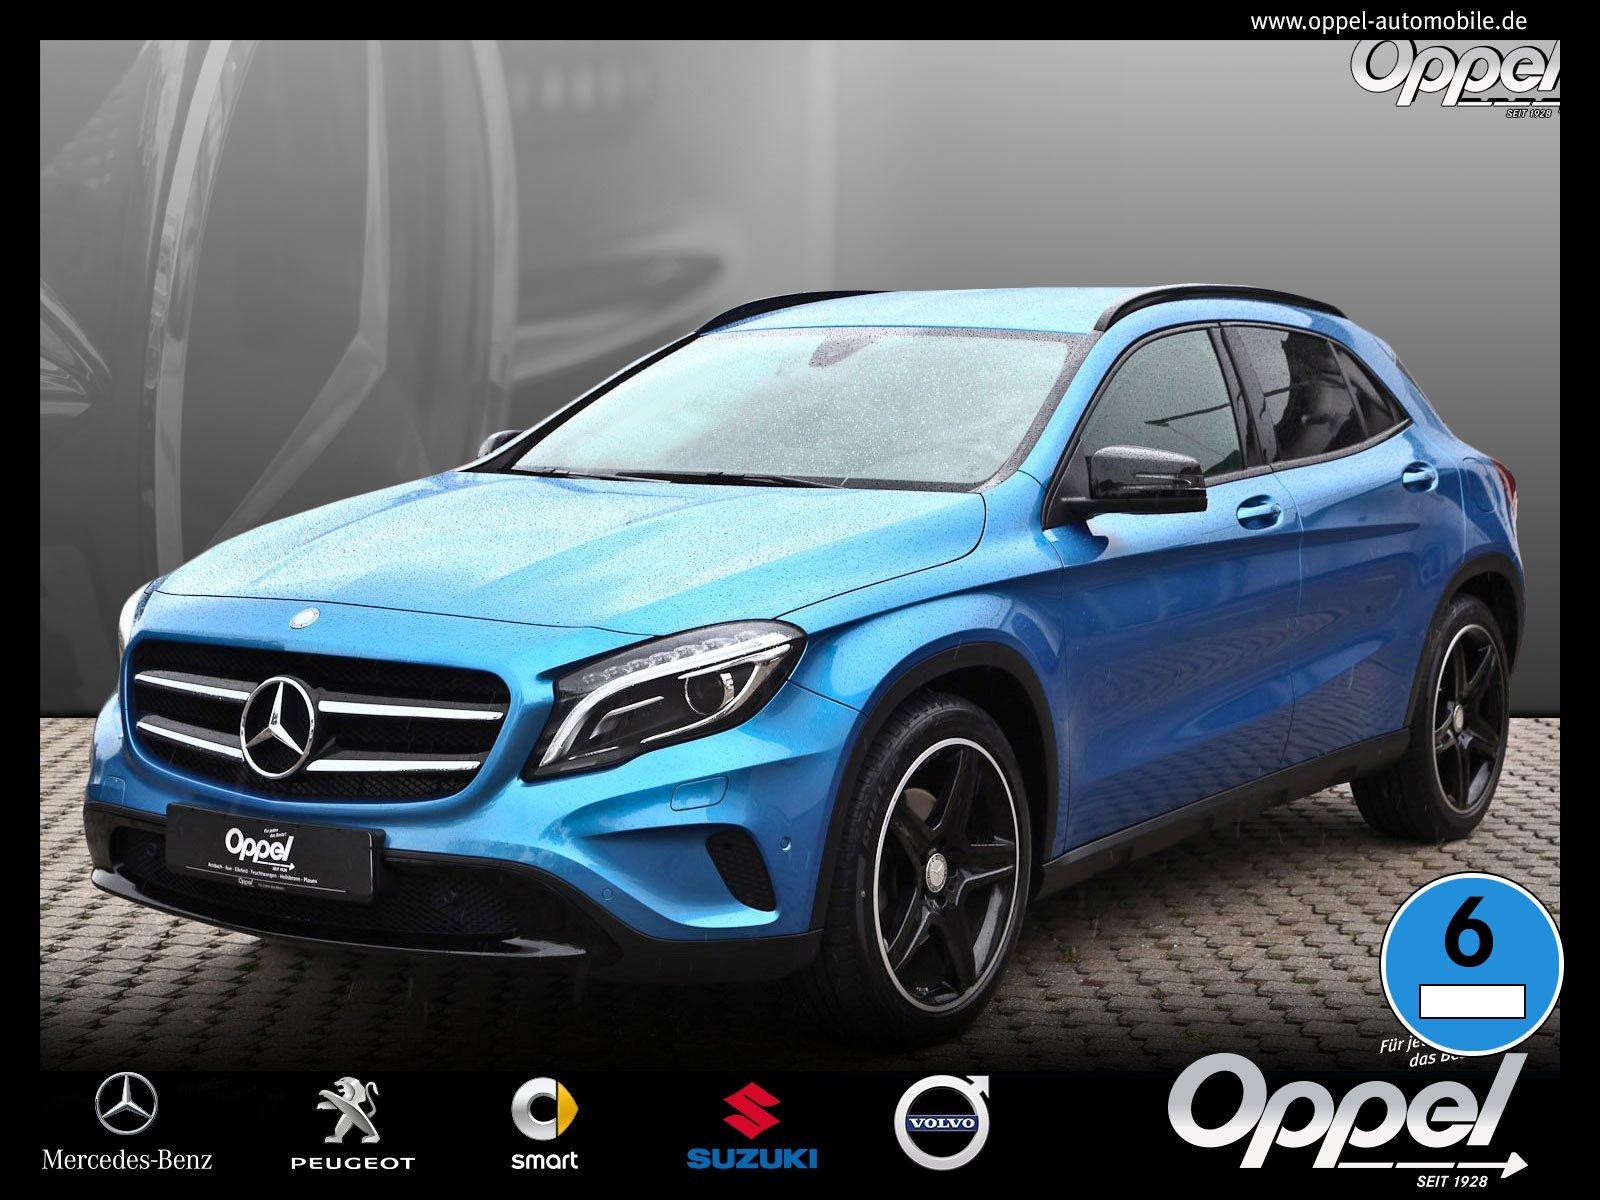 Mercedes-Benz GLA 250 Urban Kamera+ Garmin+ 7G+LM+ANK+SH+Klima, Jahr 2016, Benzin